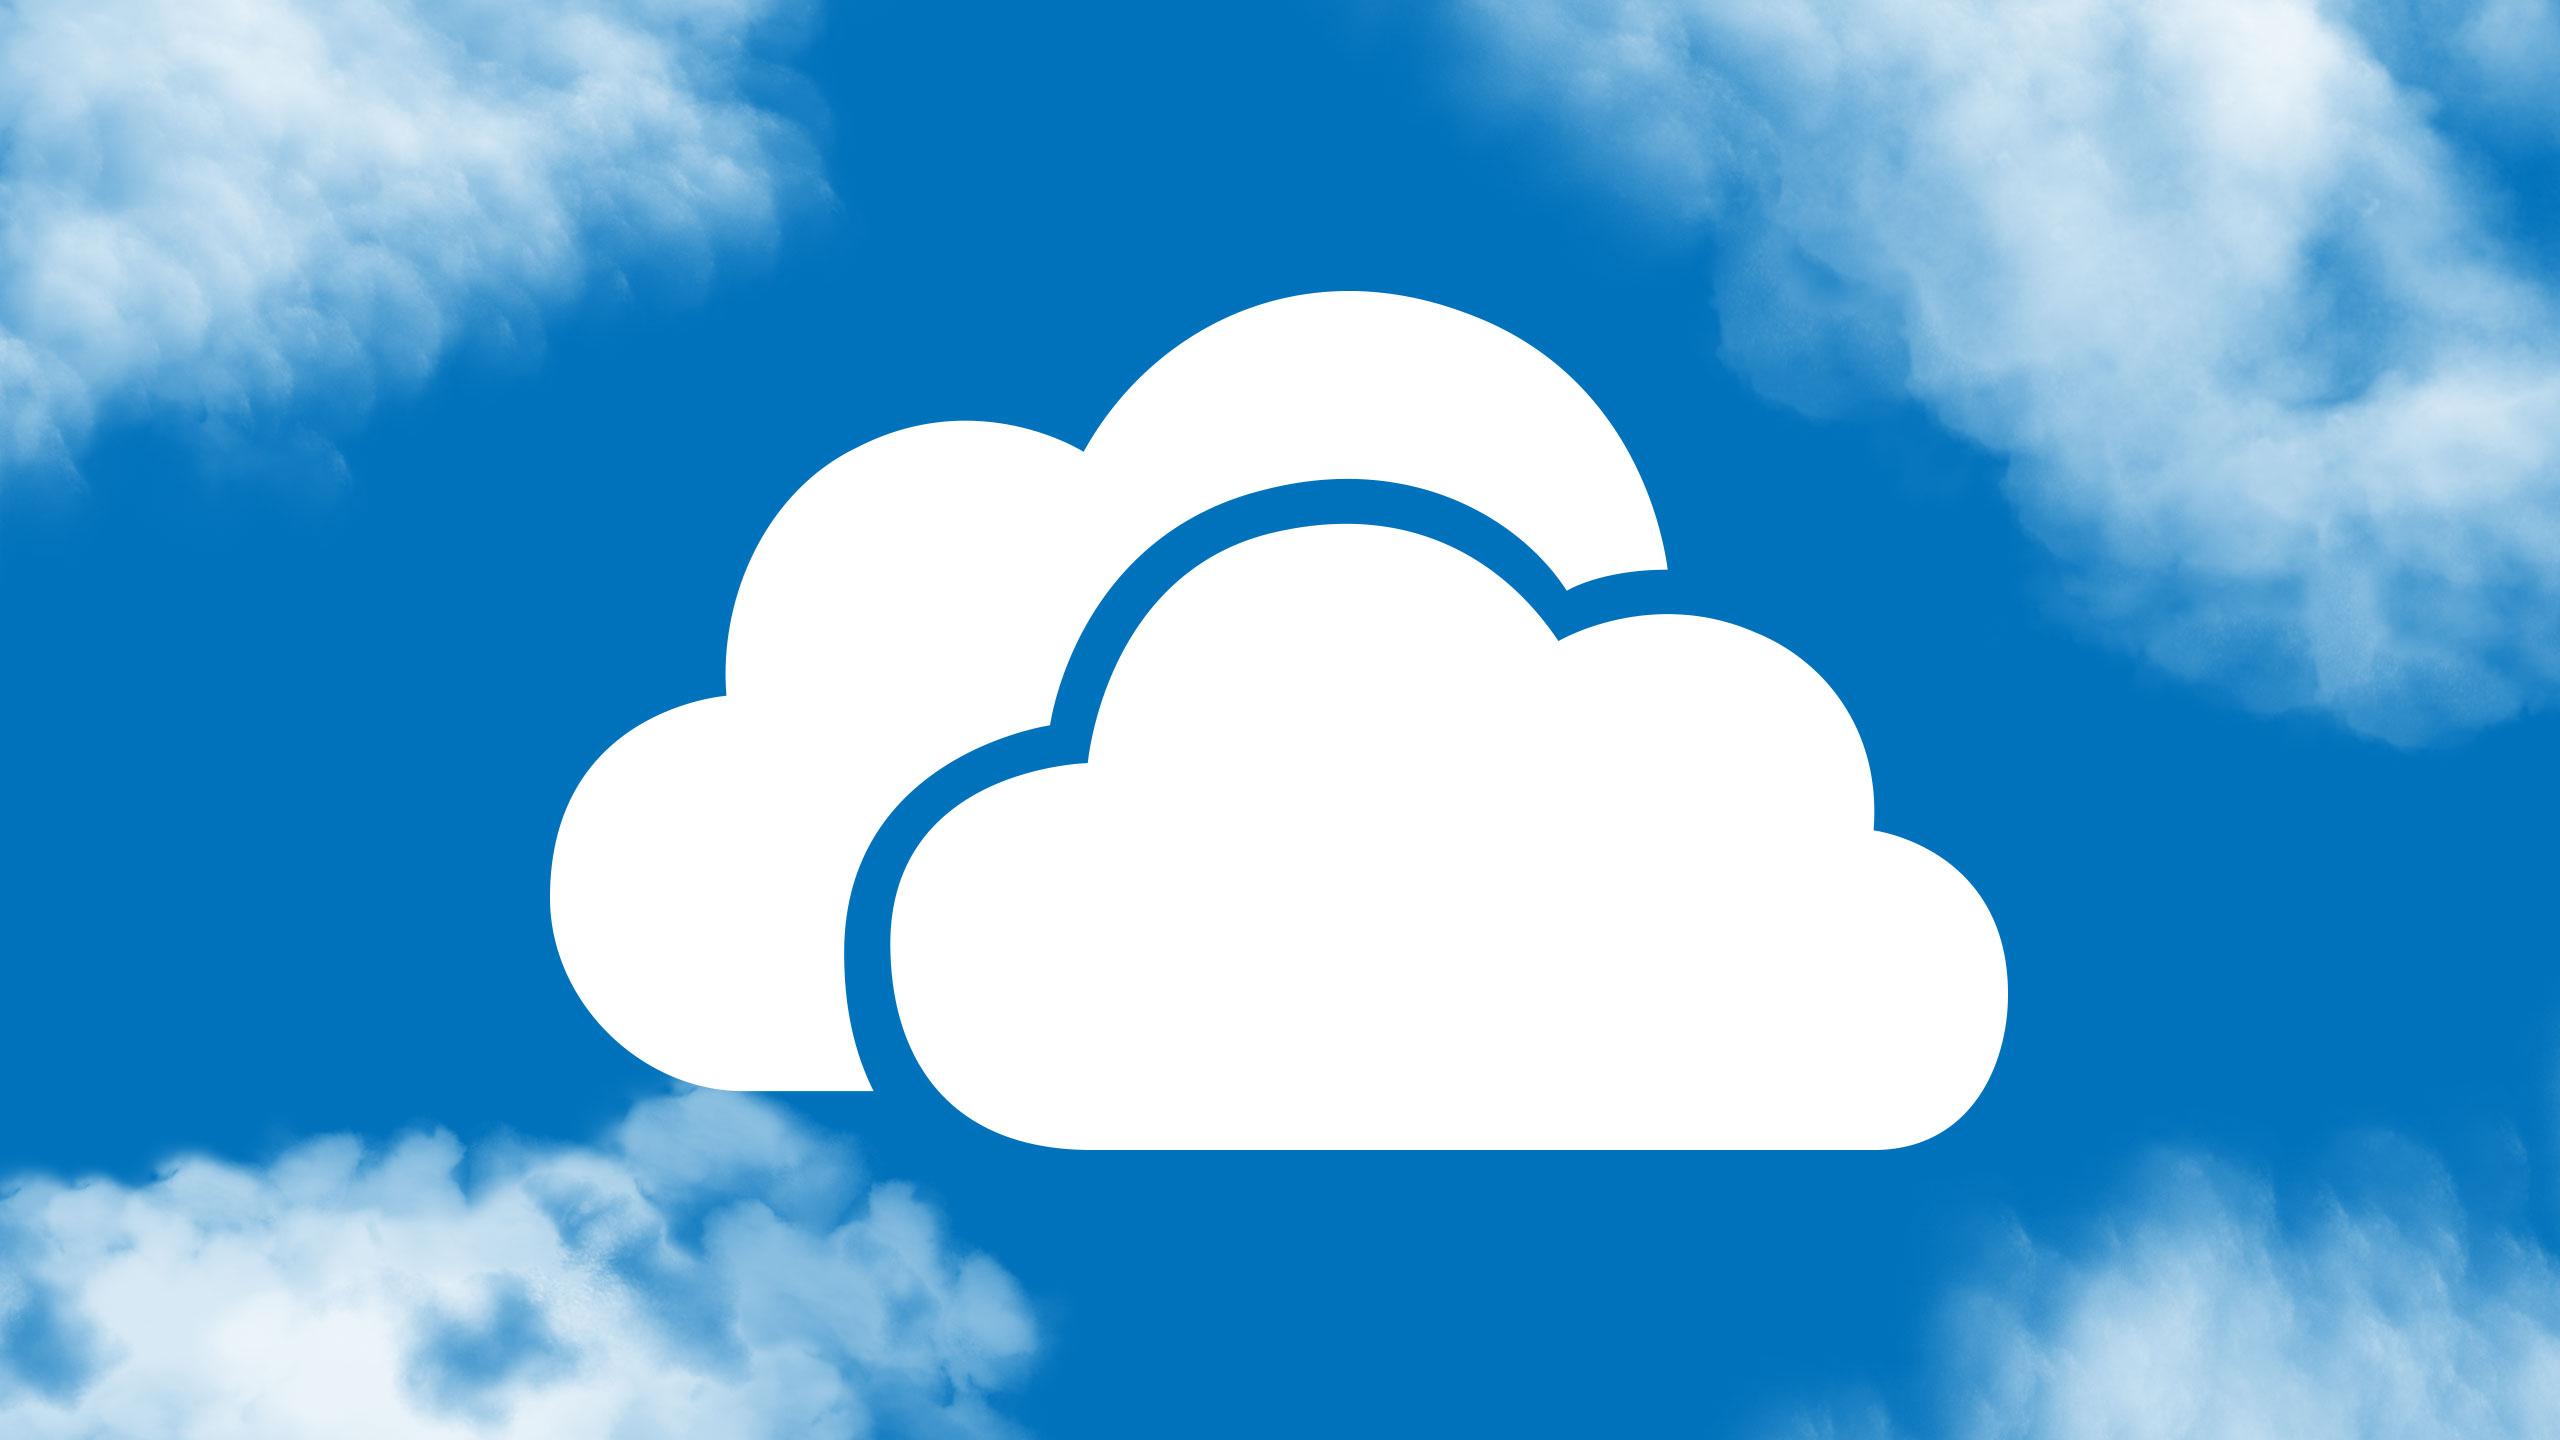 Fall Desktop Wallpaper Hd Microsoft Blurs The Line Between Desktop And Cloud With